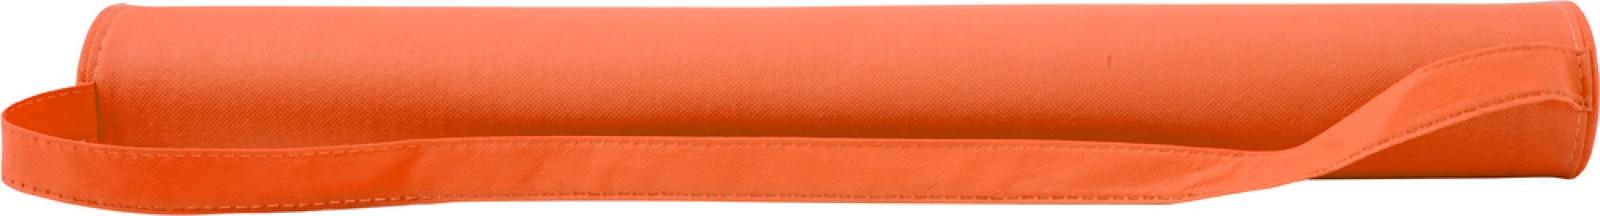 Nonwoven (80 gr/m²) beach mat - Orange